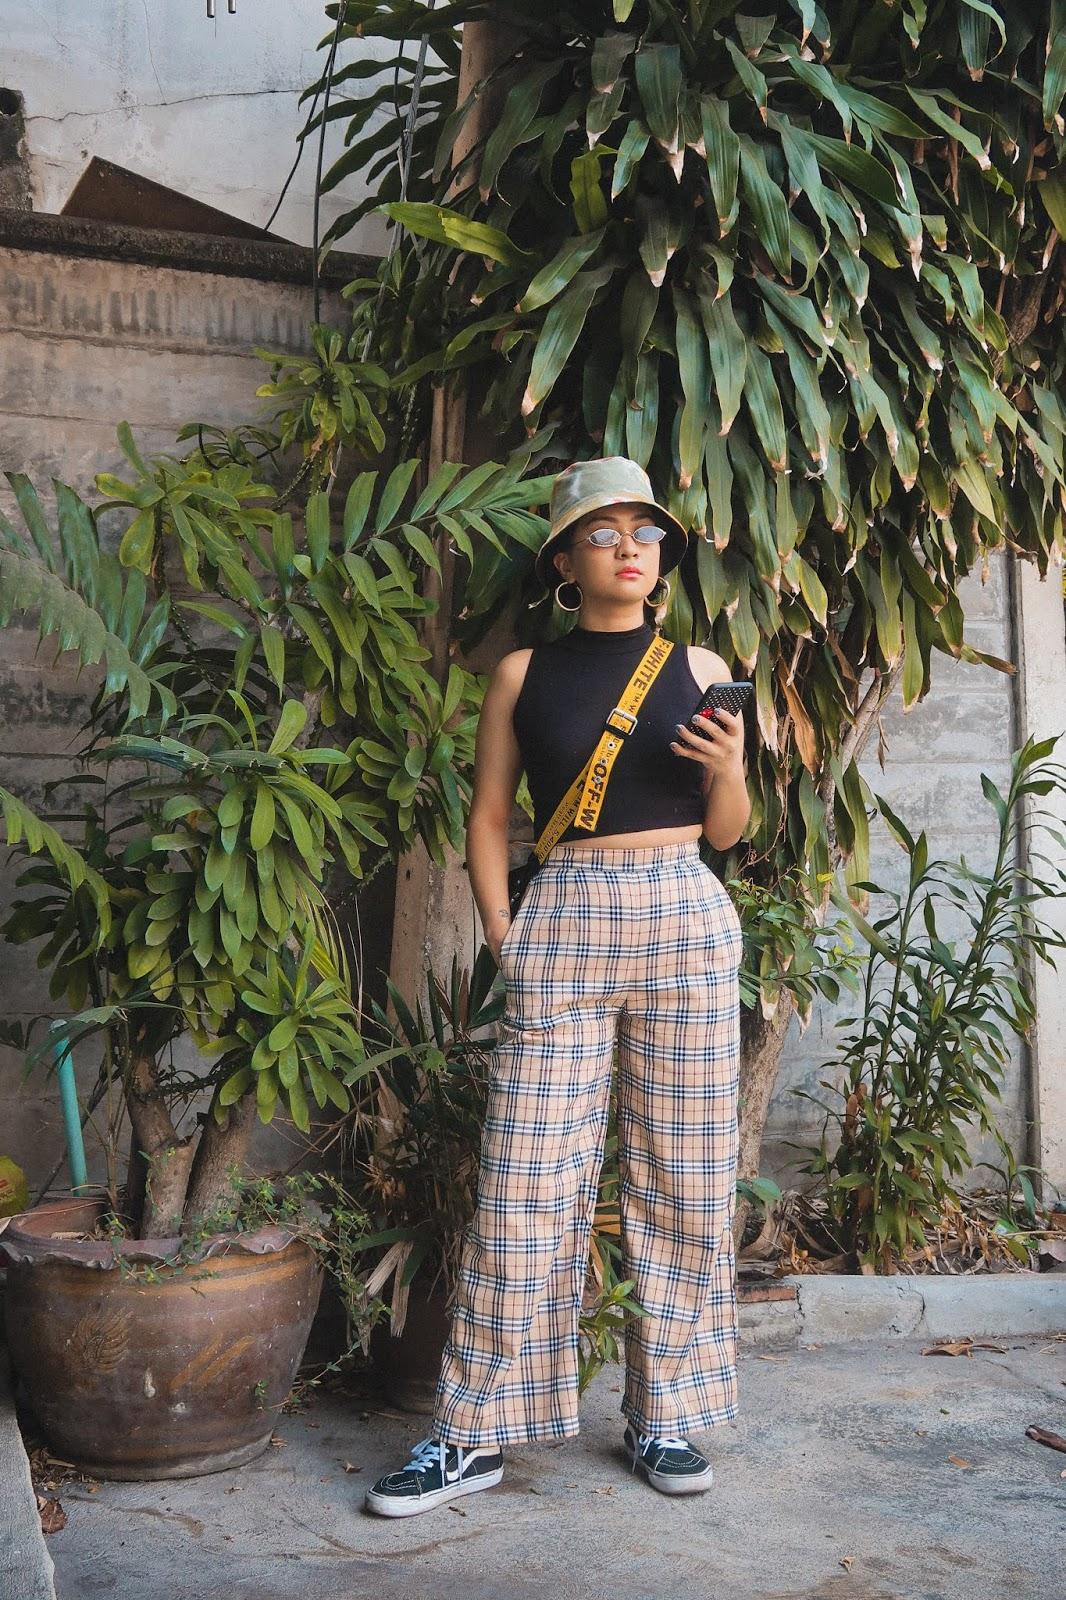 Street Fashion or Safari Adventure?